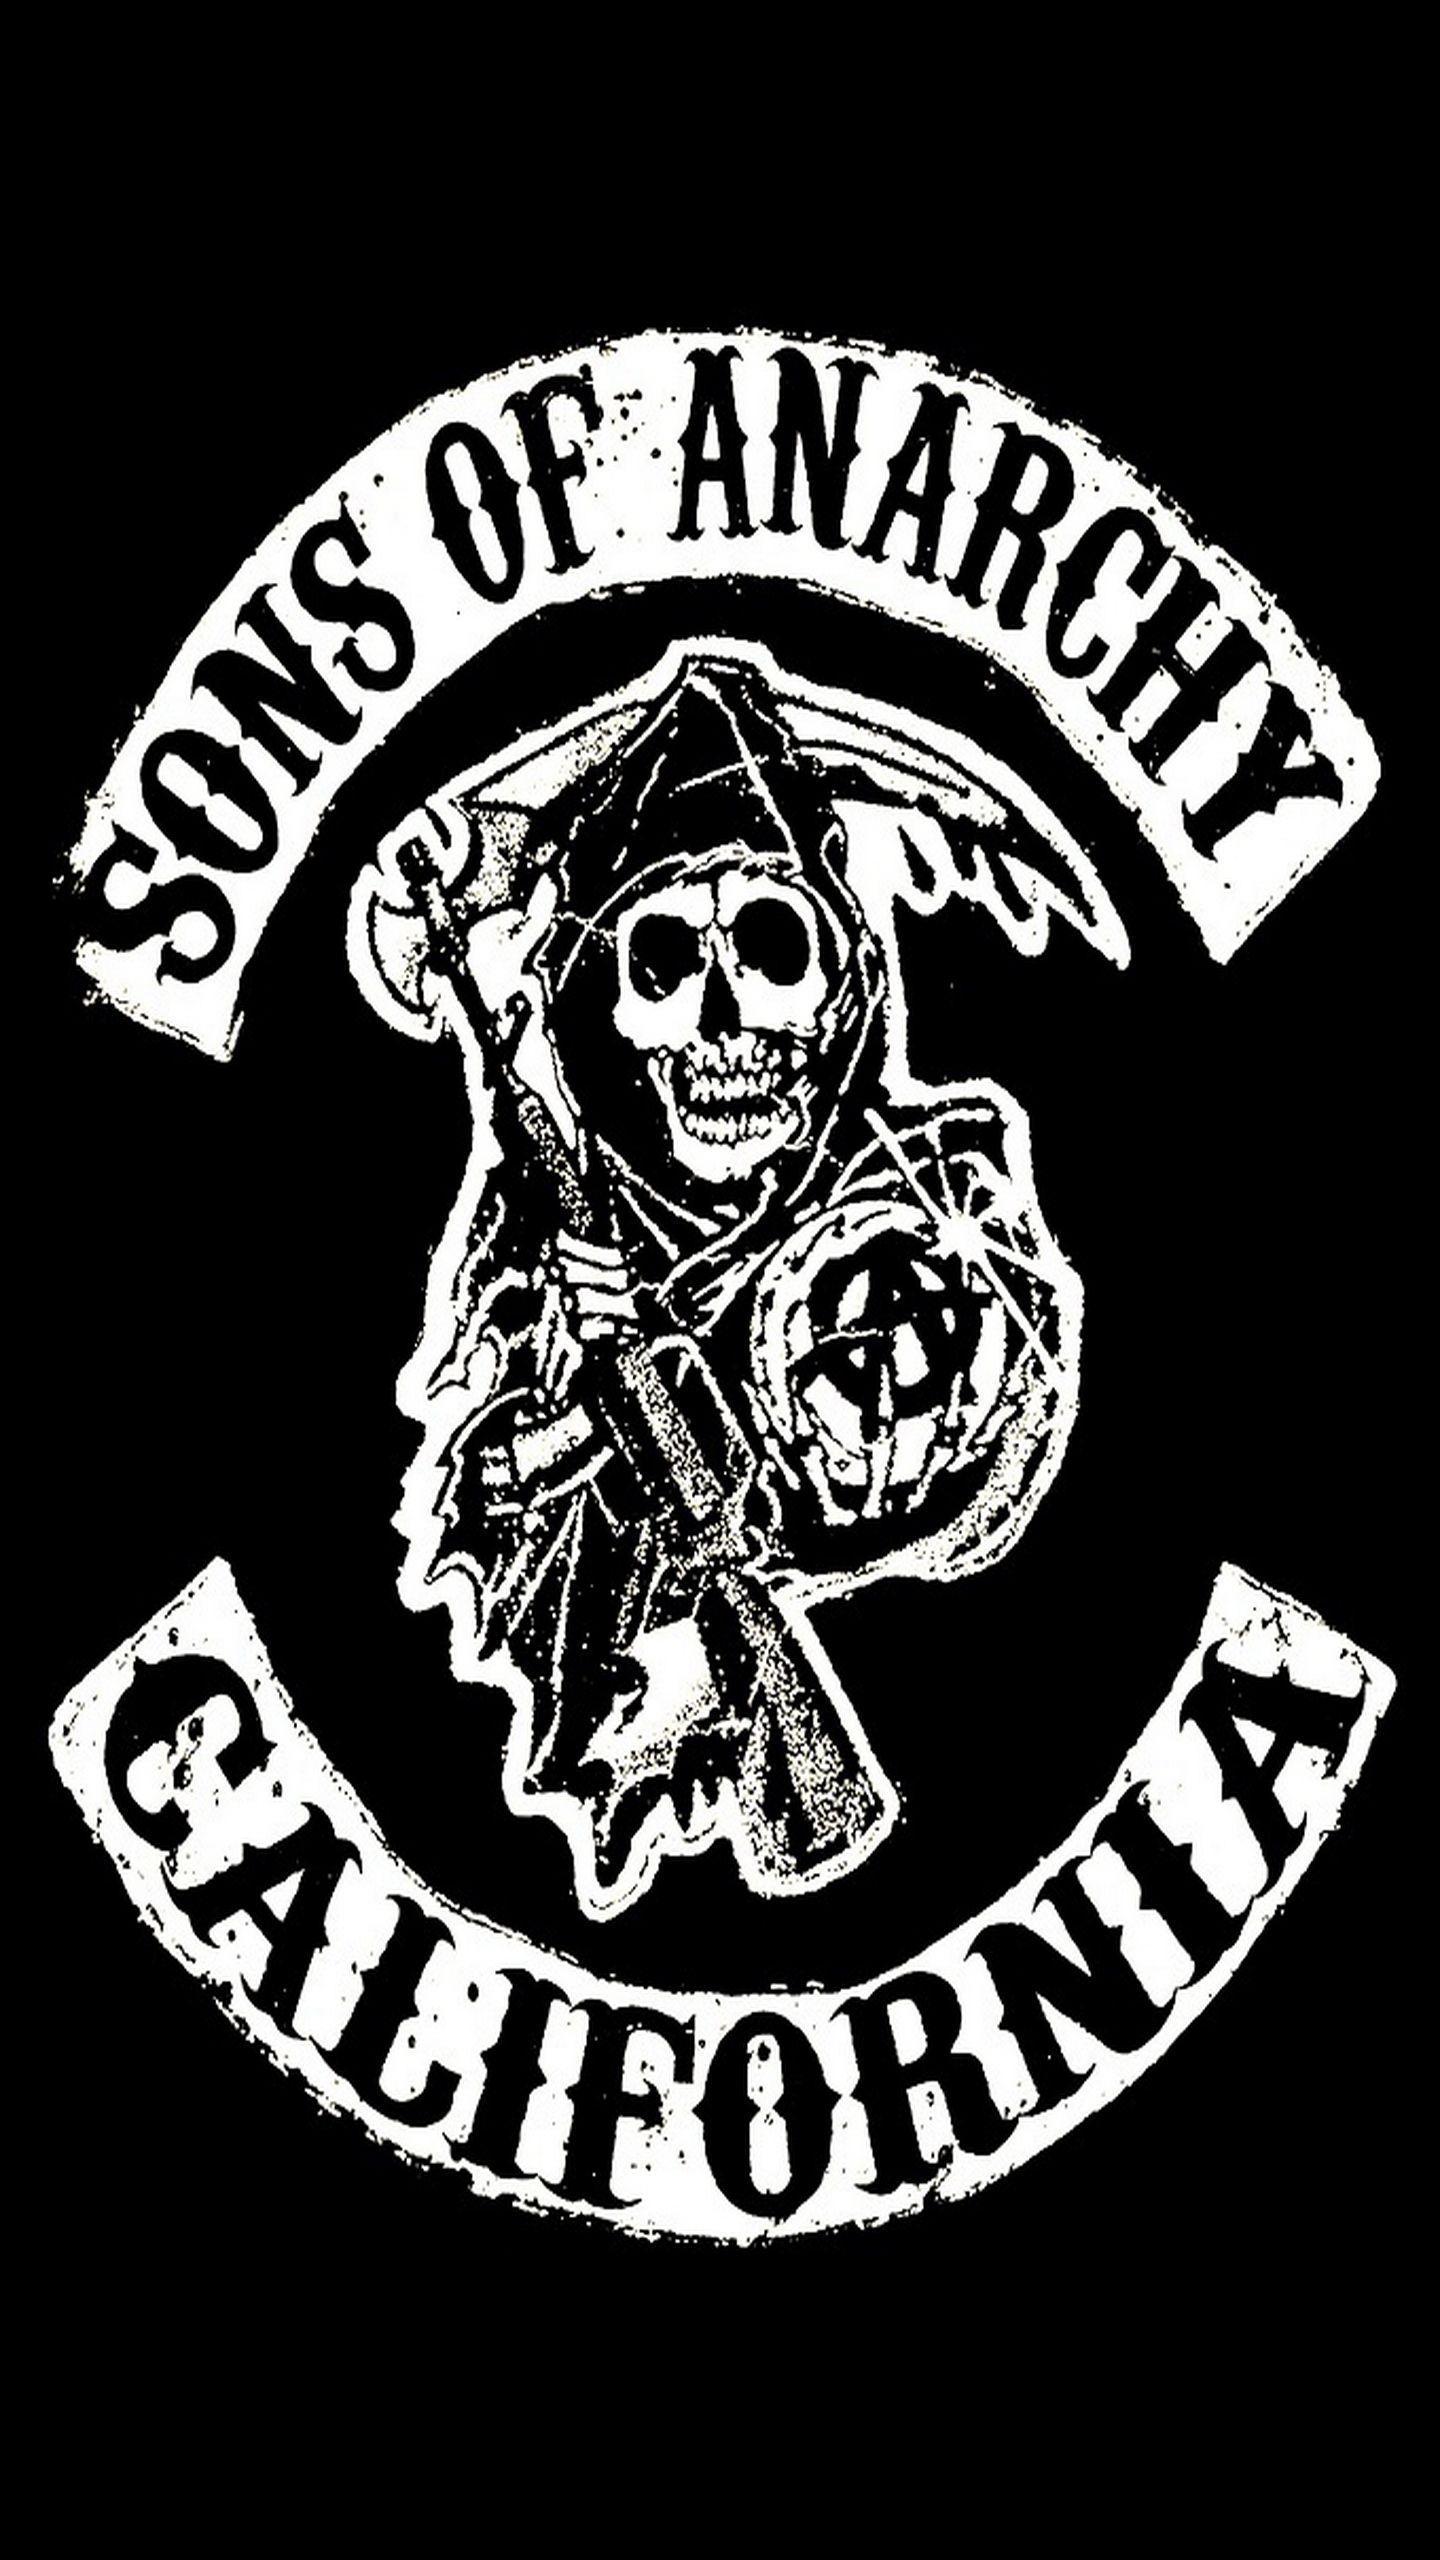 Sons Of Anarchy Wallpaper : anarchy, wallpaper, Anarchy, Wallpapers, Wallpaper